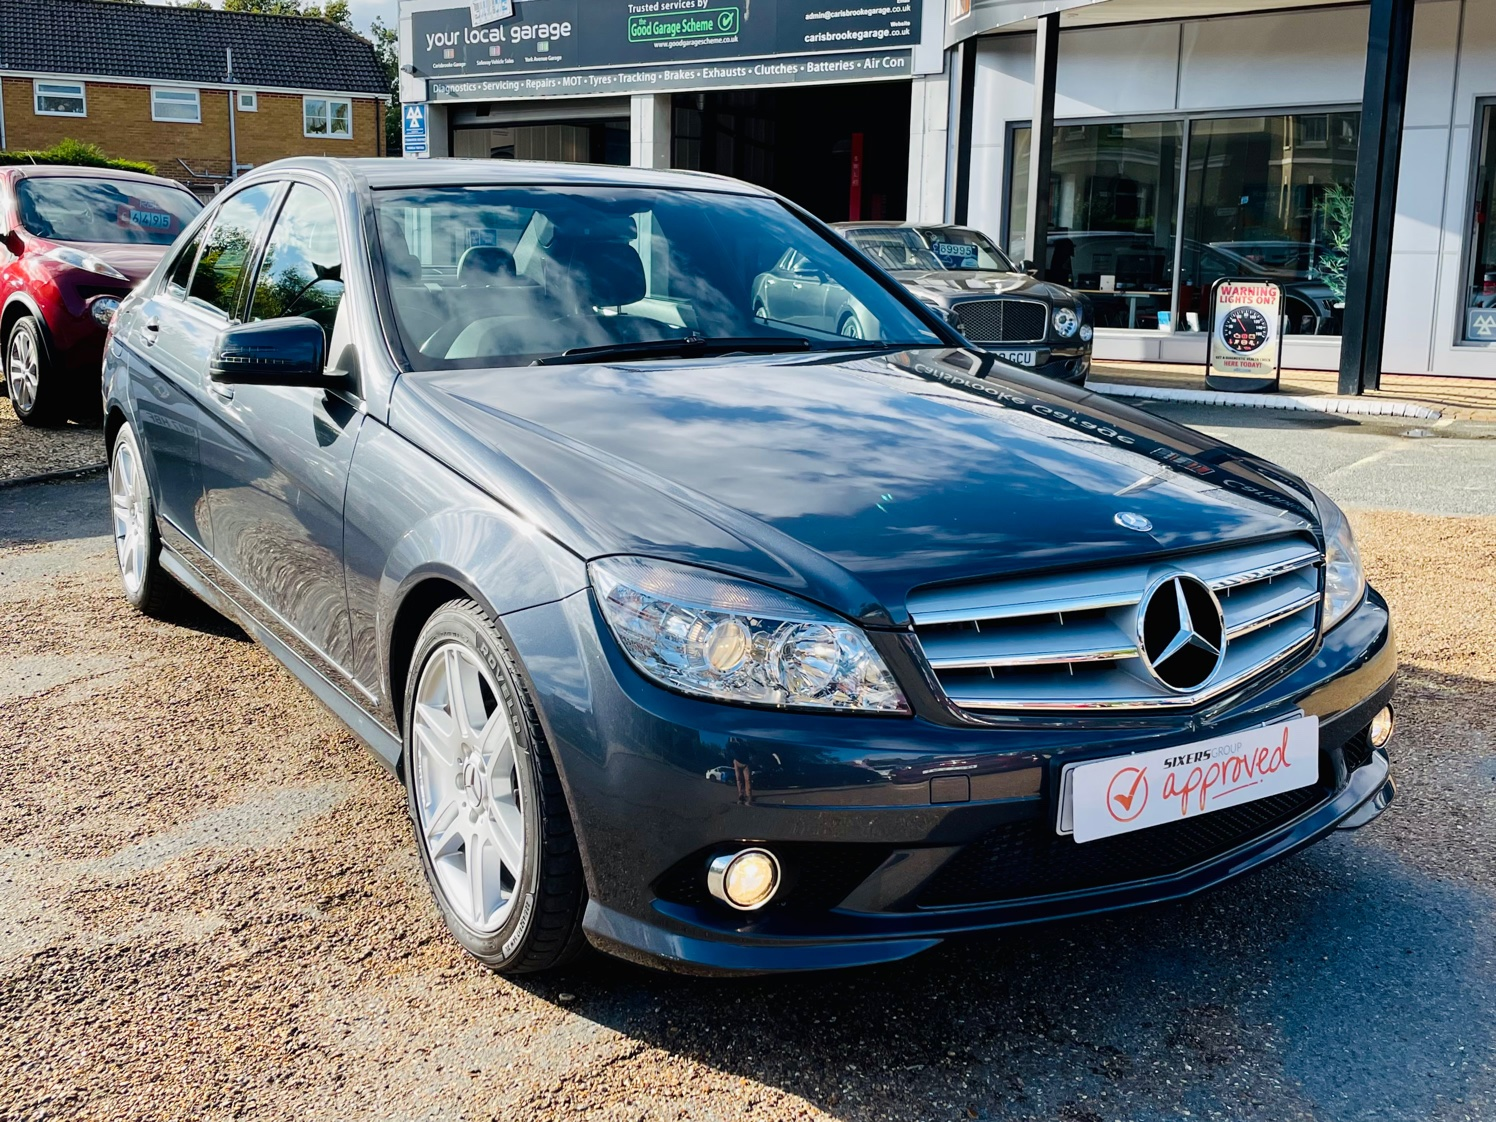 Car For Sale Mercedes C-Class - KP58ZHH Sixers Group Image #1